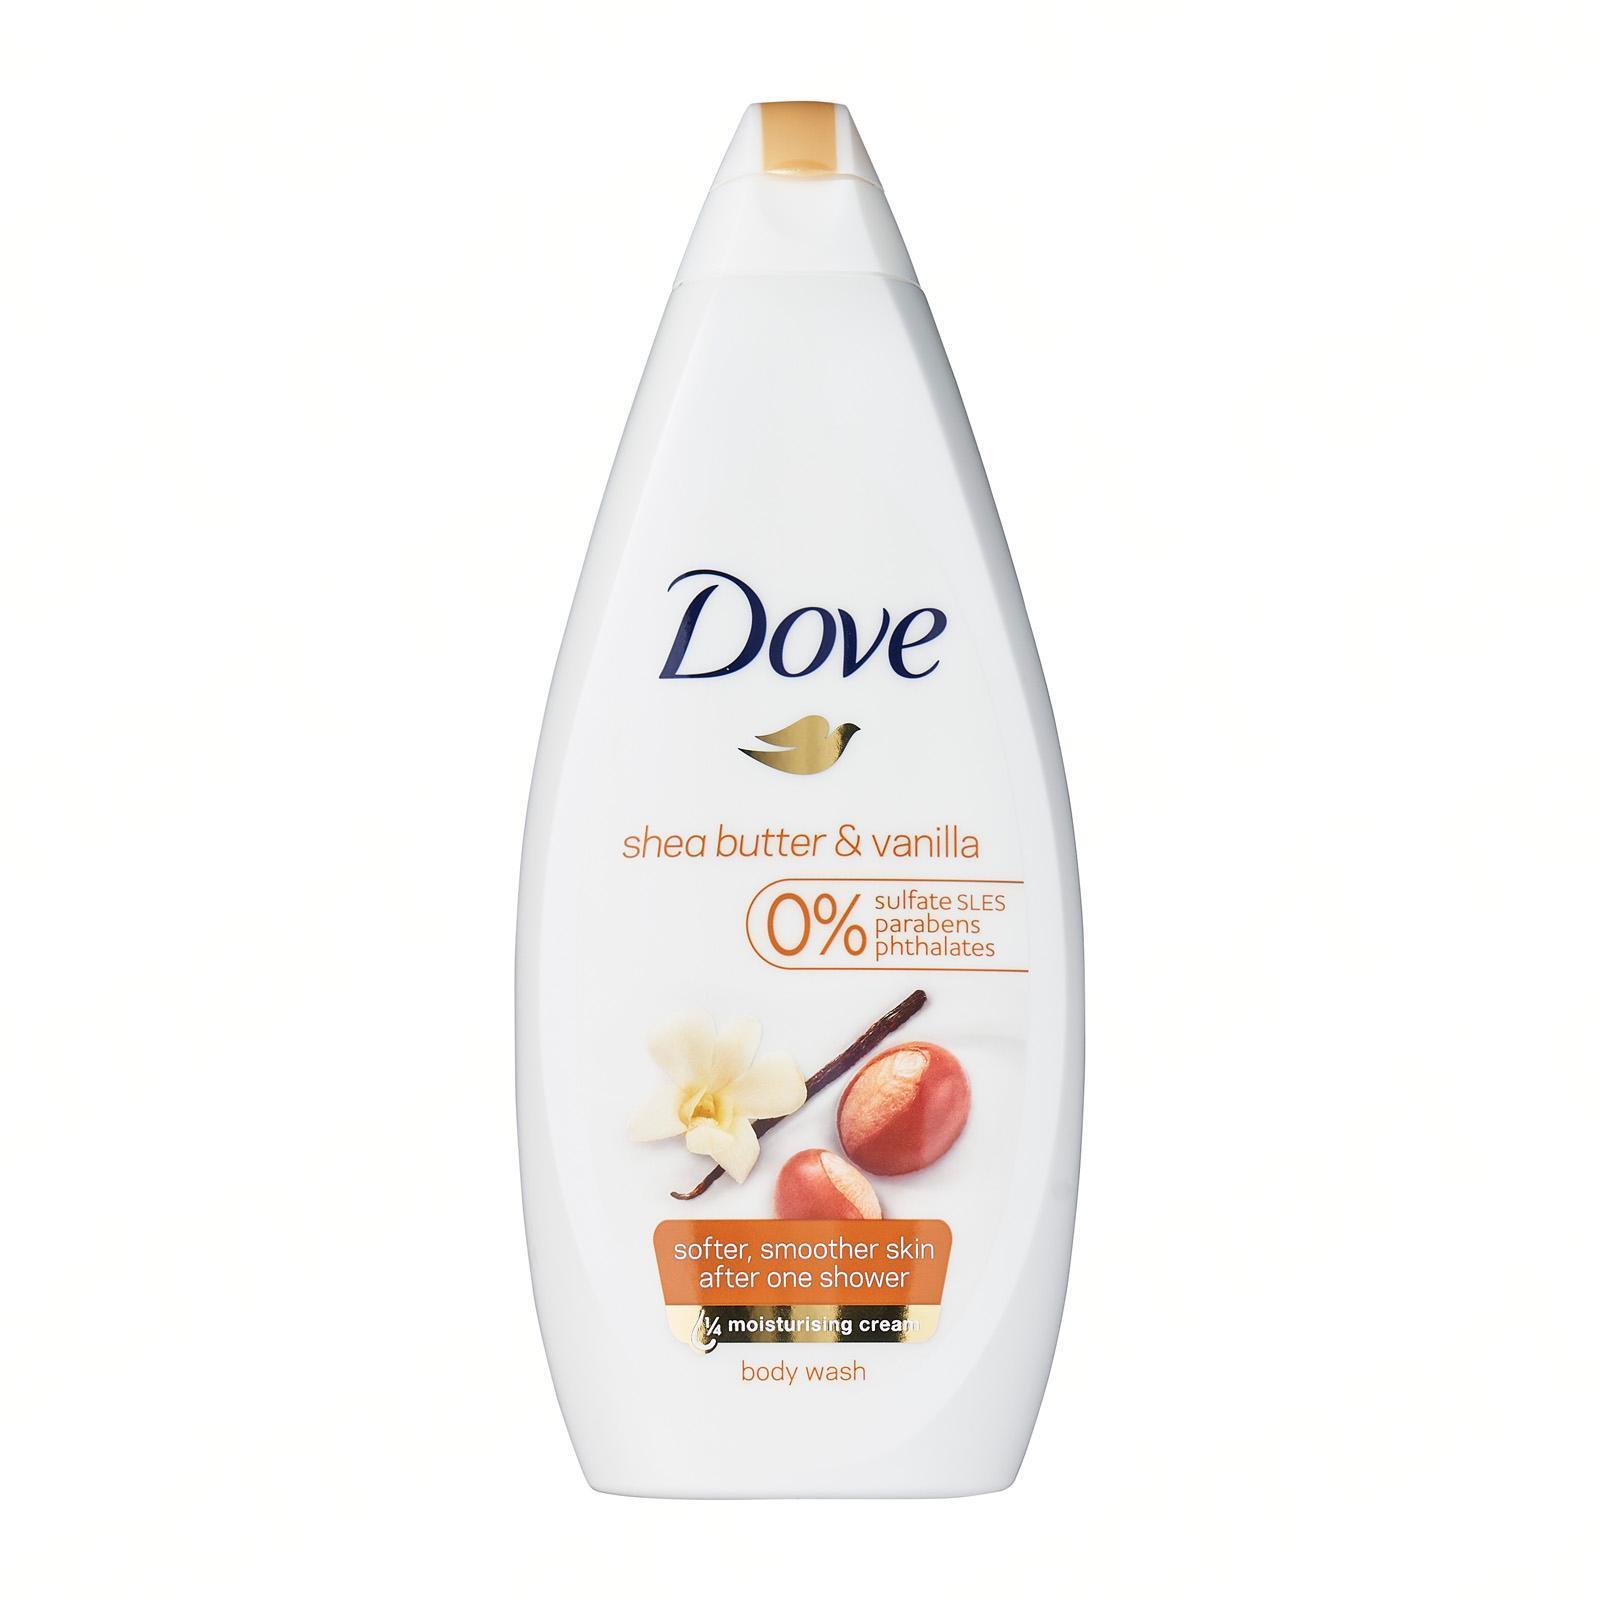 Dove Body Wash Shea Butter and Vanilla